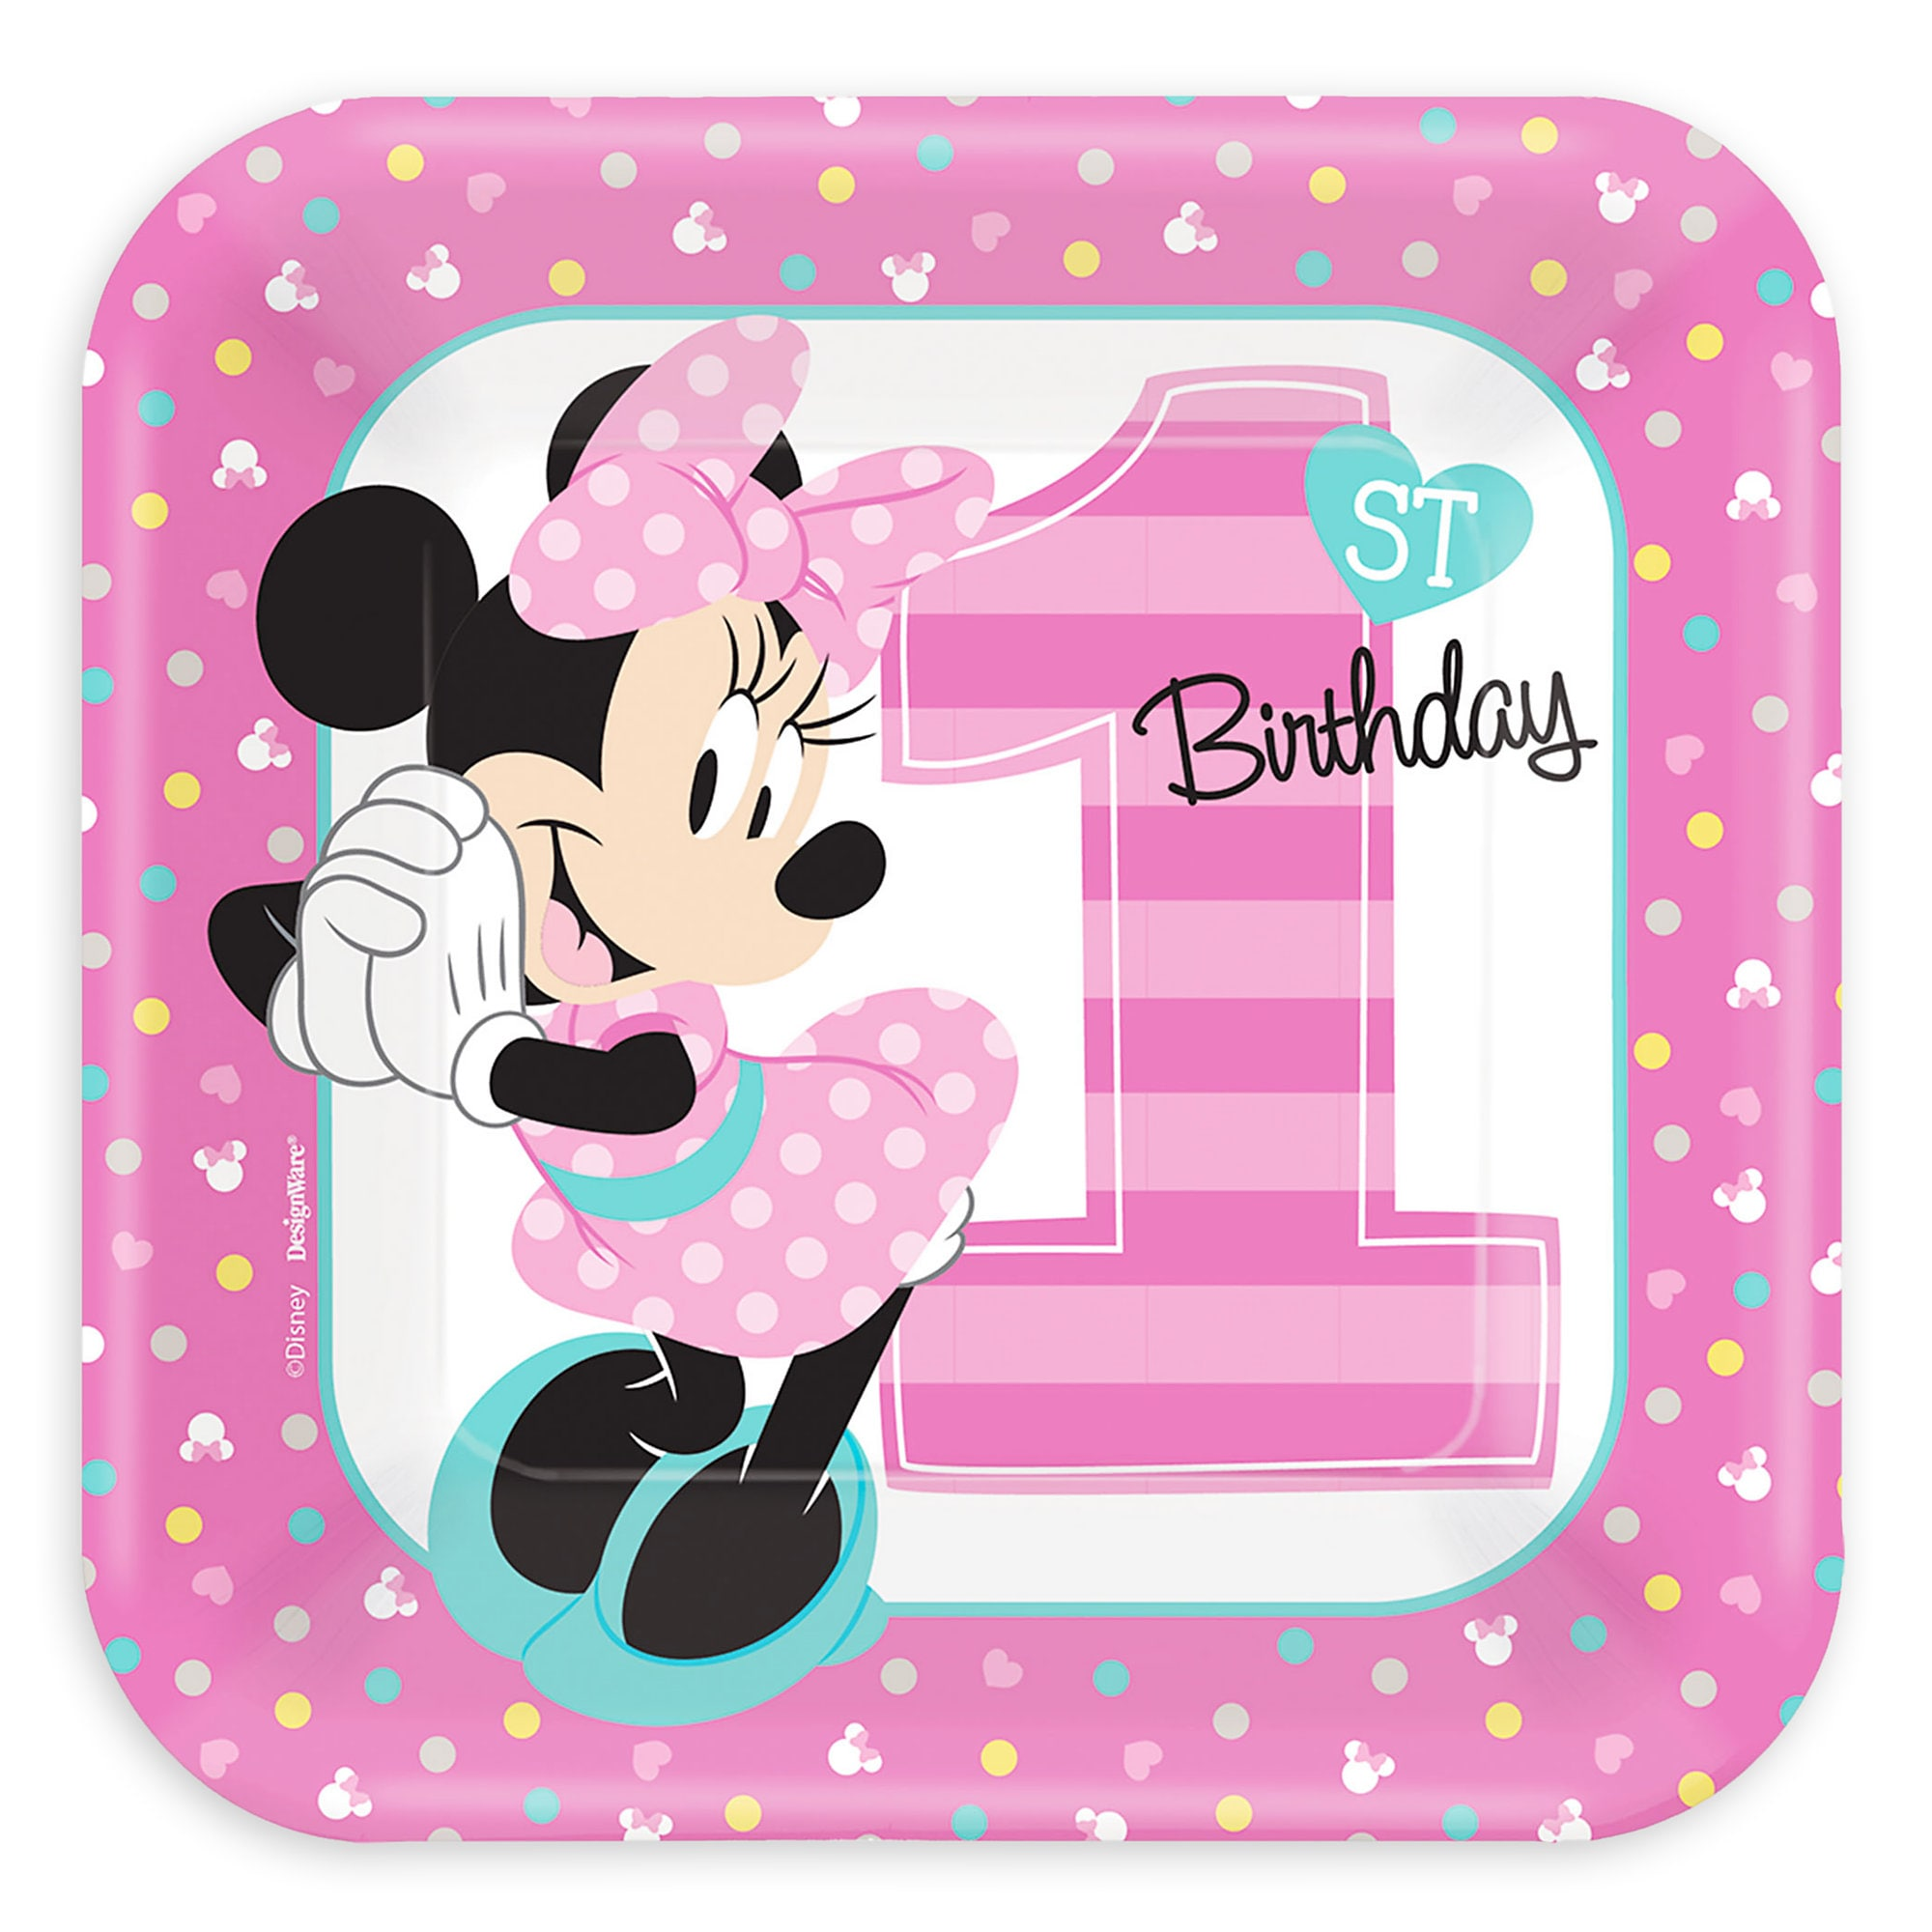 Minnie Mouse 1st Birthday Dessert Plates  sc 1 st  shopDisney & Minnie Mouse 1st Birthday Dessert Plates | shopDisney